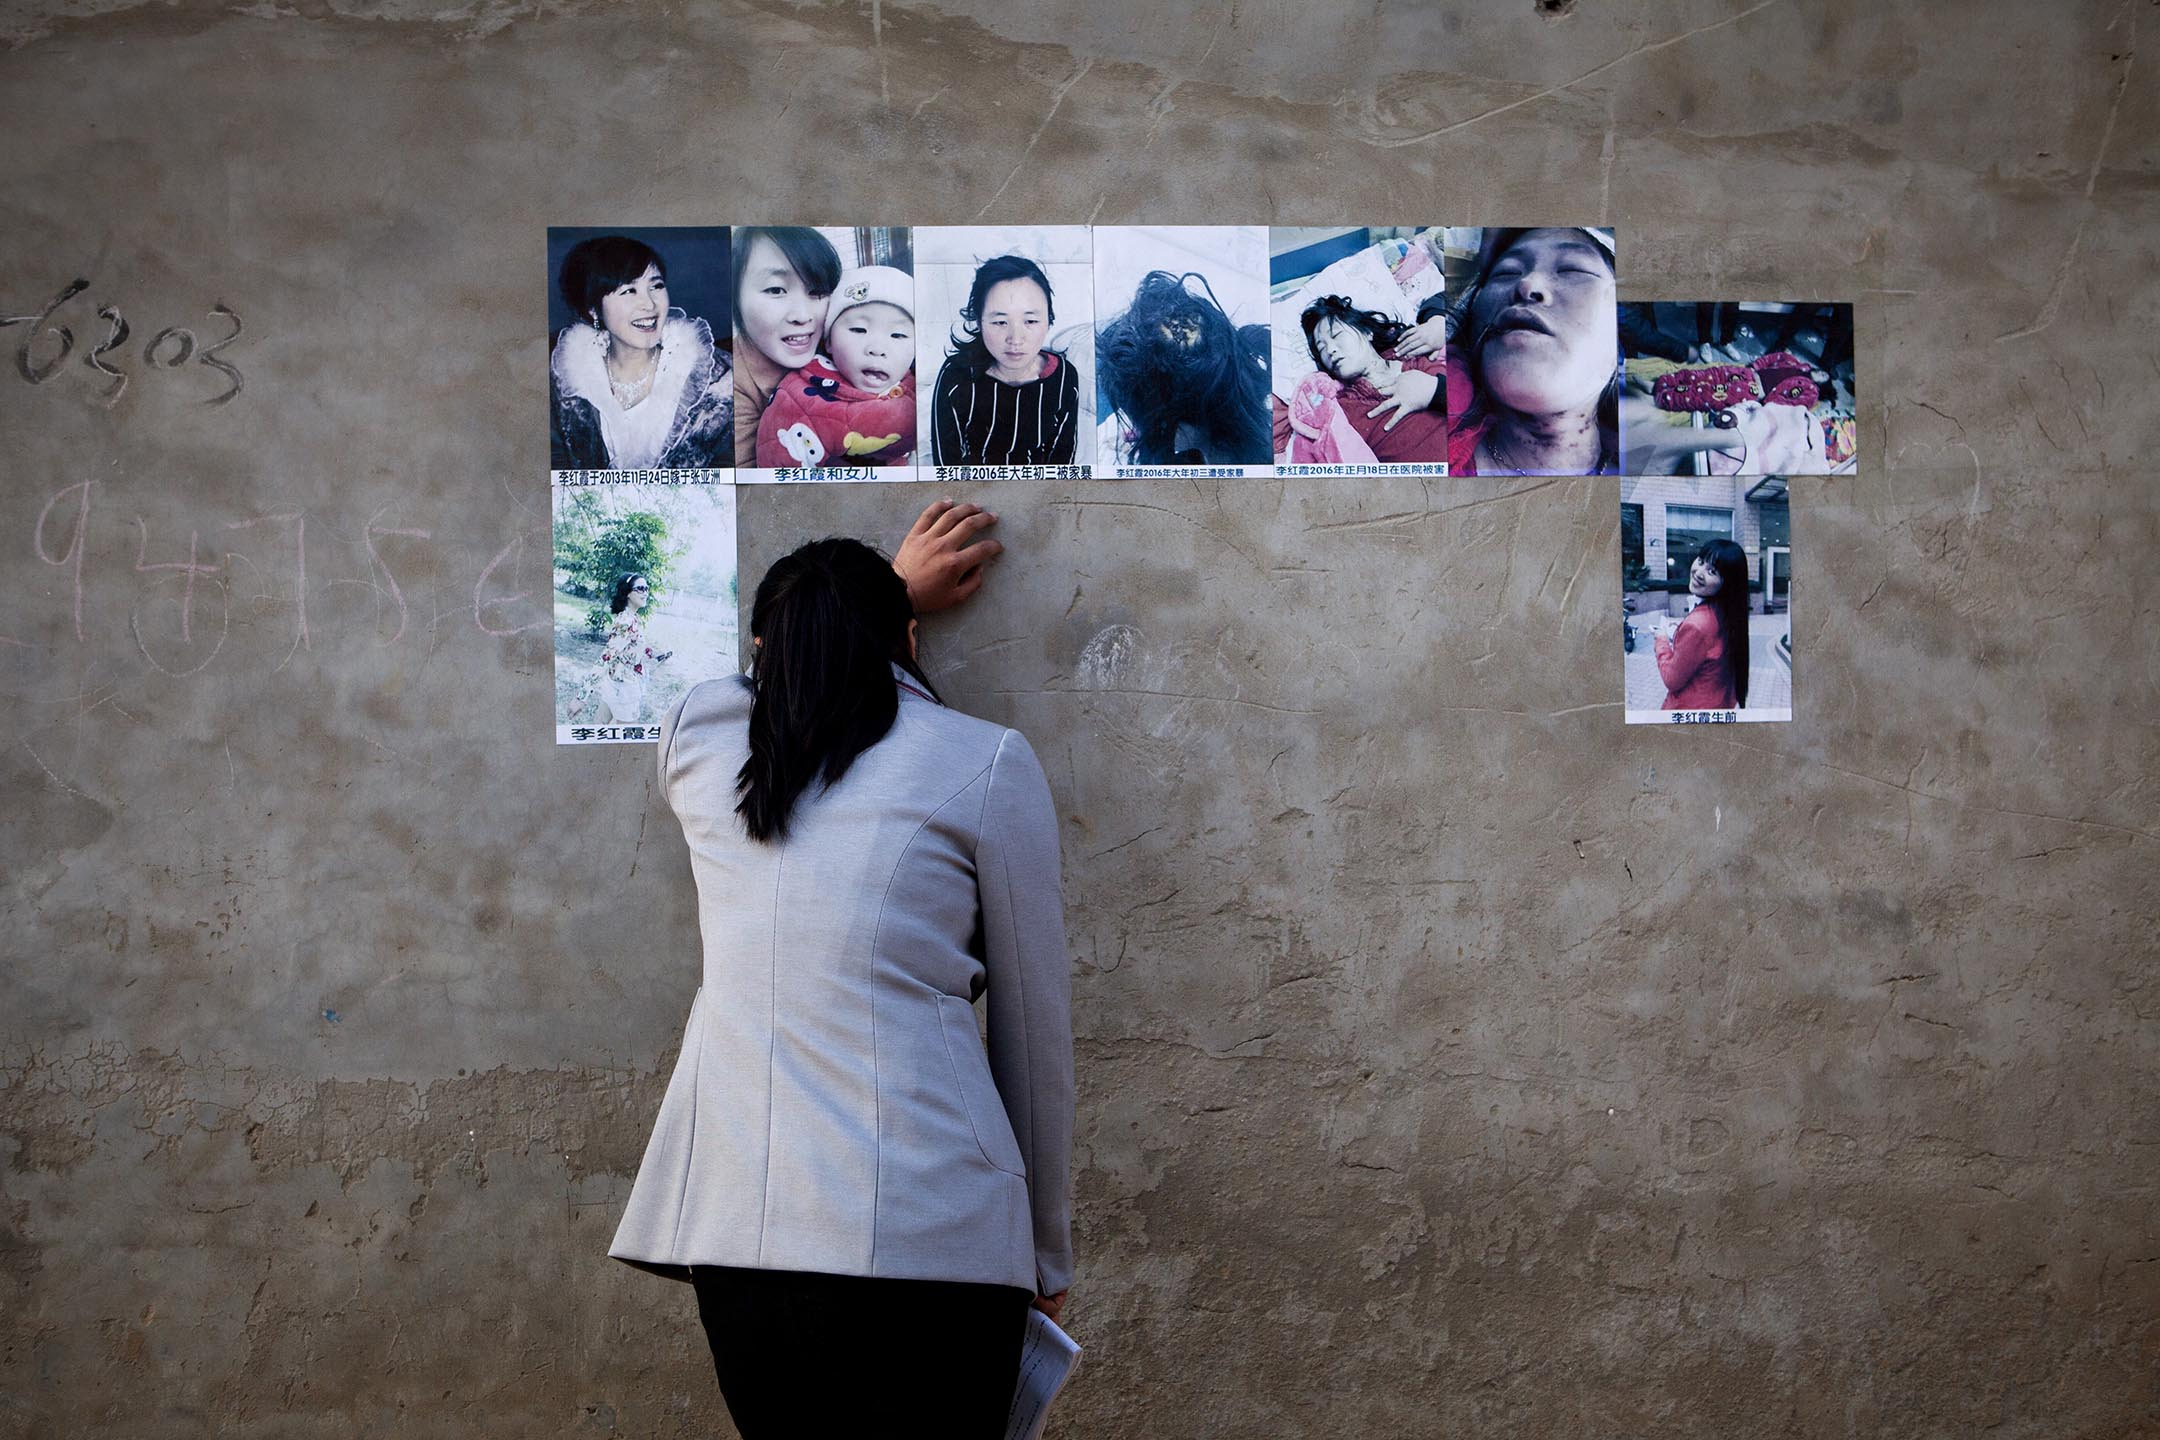 2016年3月31日河南省周口市,親人哭著看她因家暴死去的姐姐的照片。 攝:Giulia March/The Washington Post via Getty Images